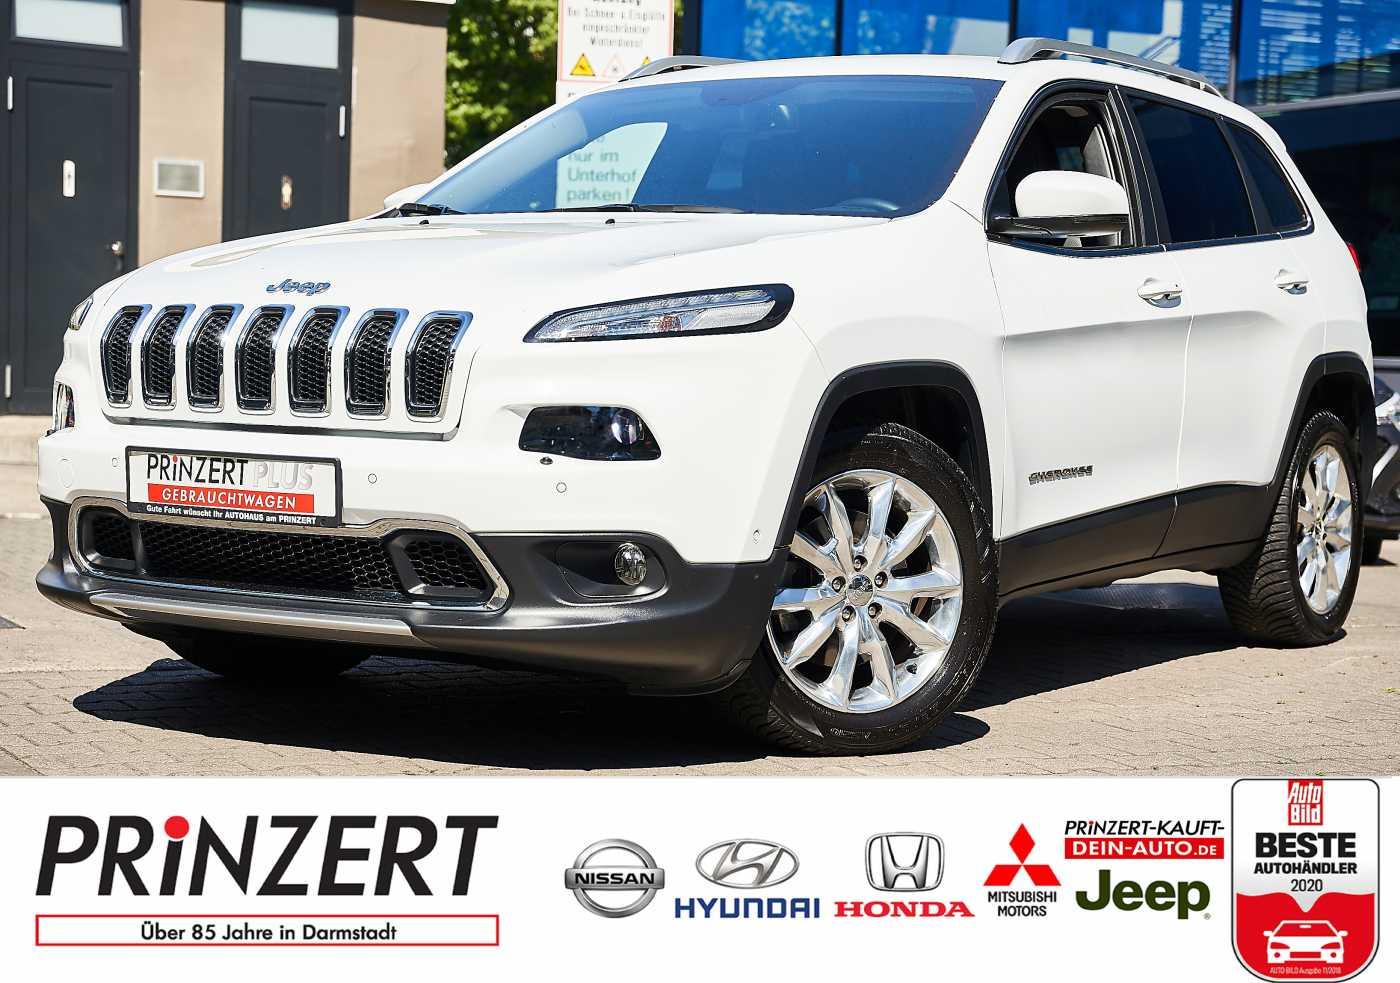 Jeep Cherokee 2.0D MT Limited 2WD Navi&Sound PGD, Jahr 2015, Diesel